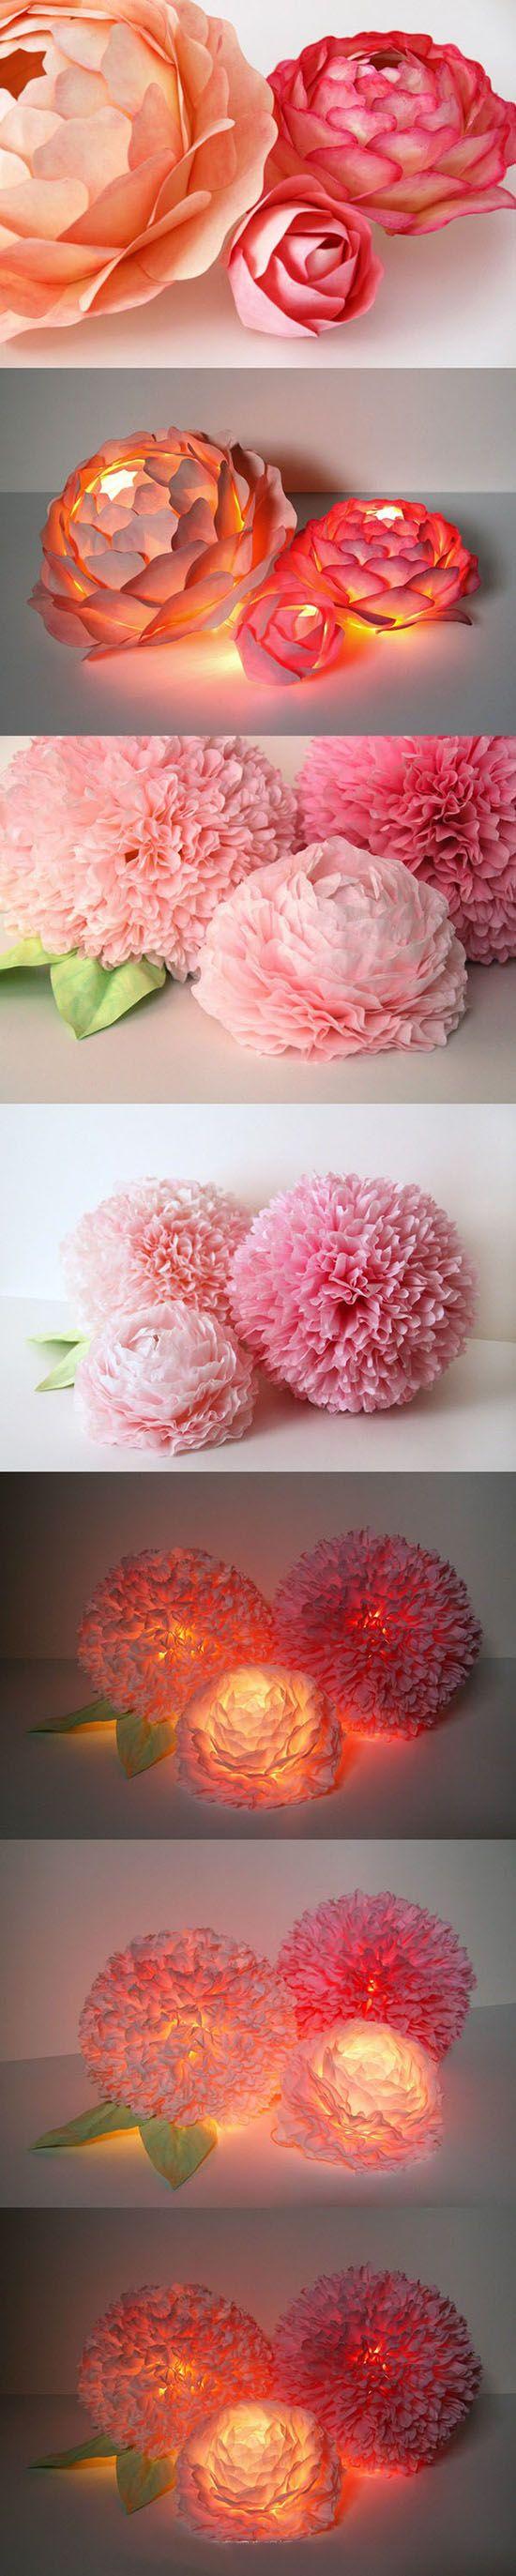 best crafts images on pinterest creative crafts crochet